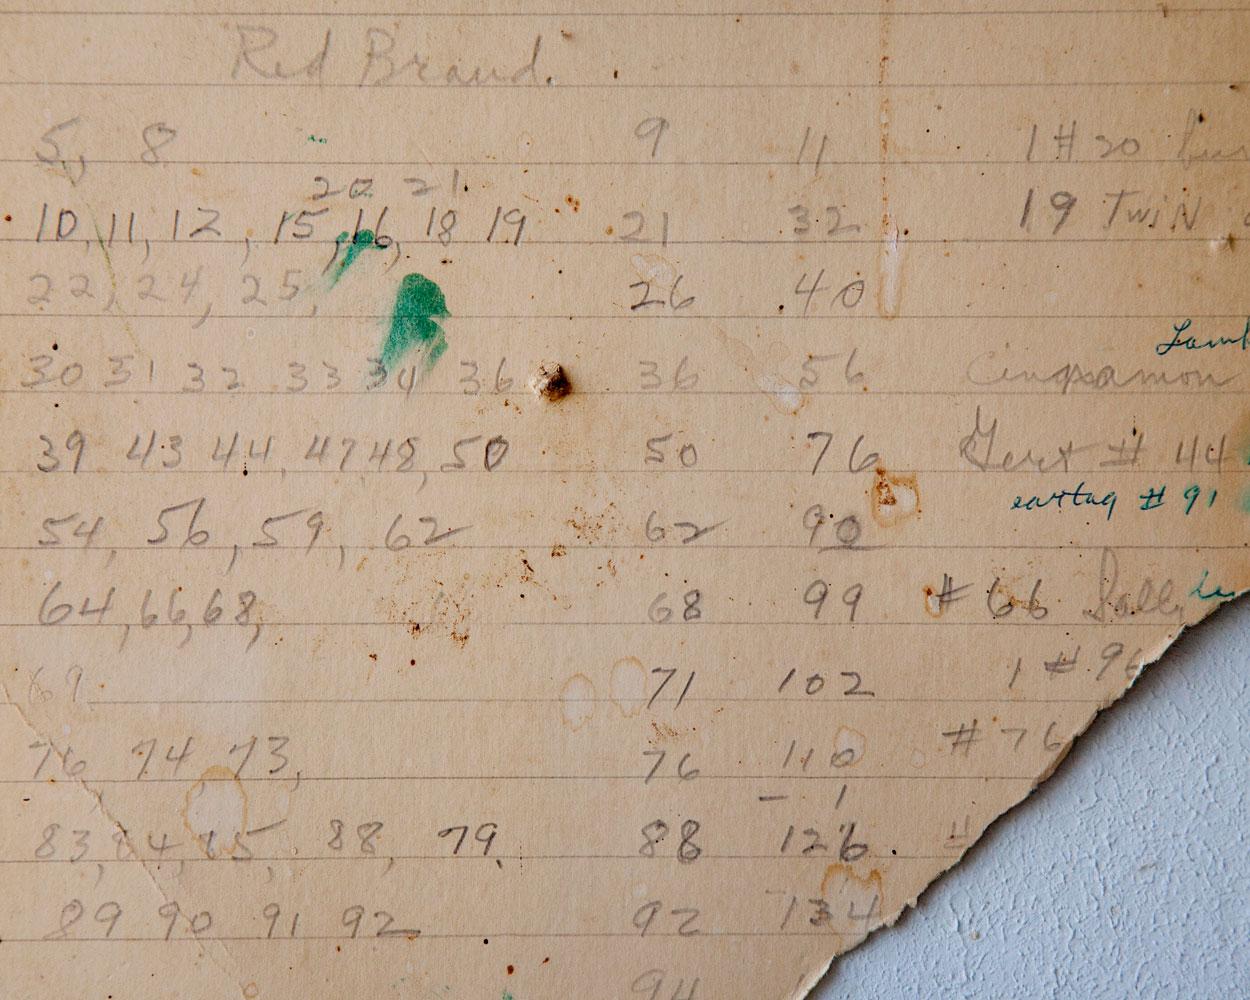 "Title: 196J-19617 (lambing chart), Archival pigment print, 16x20"", 2011"